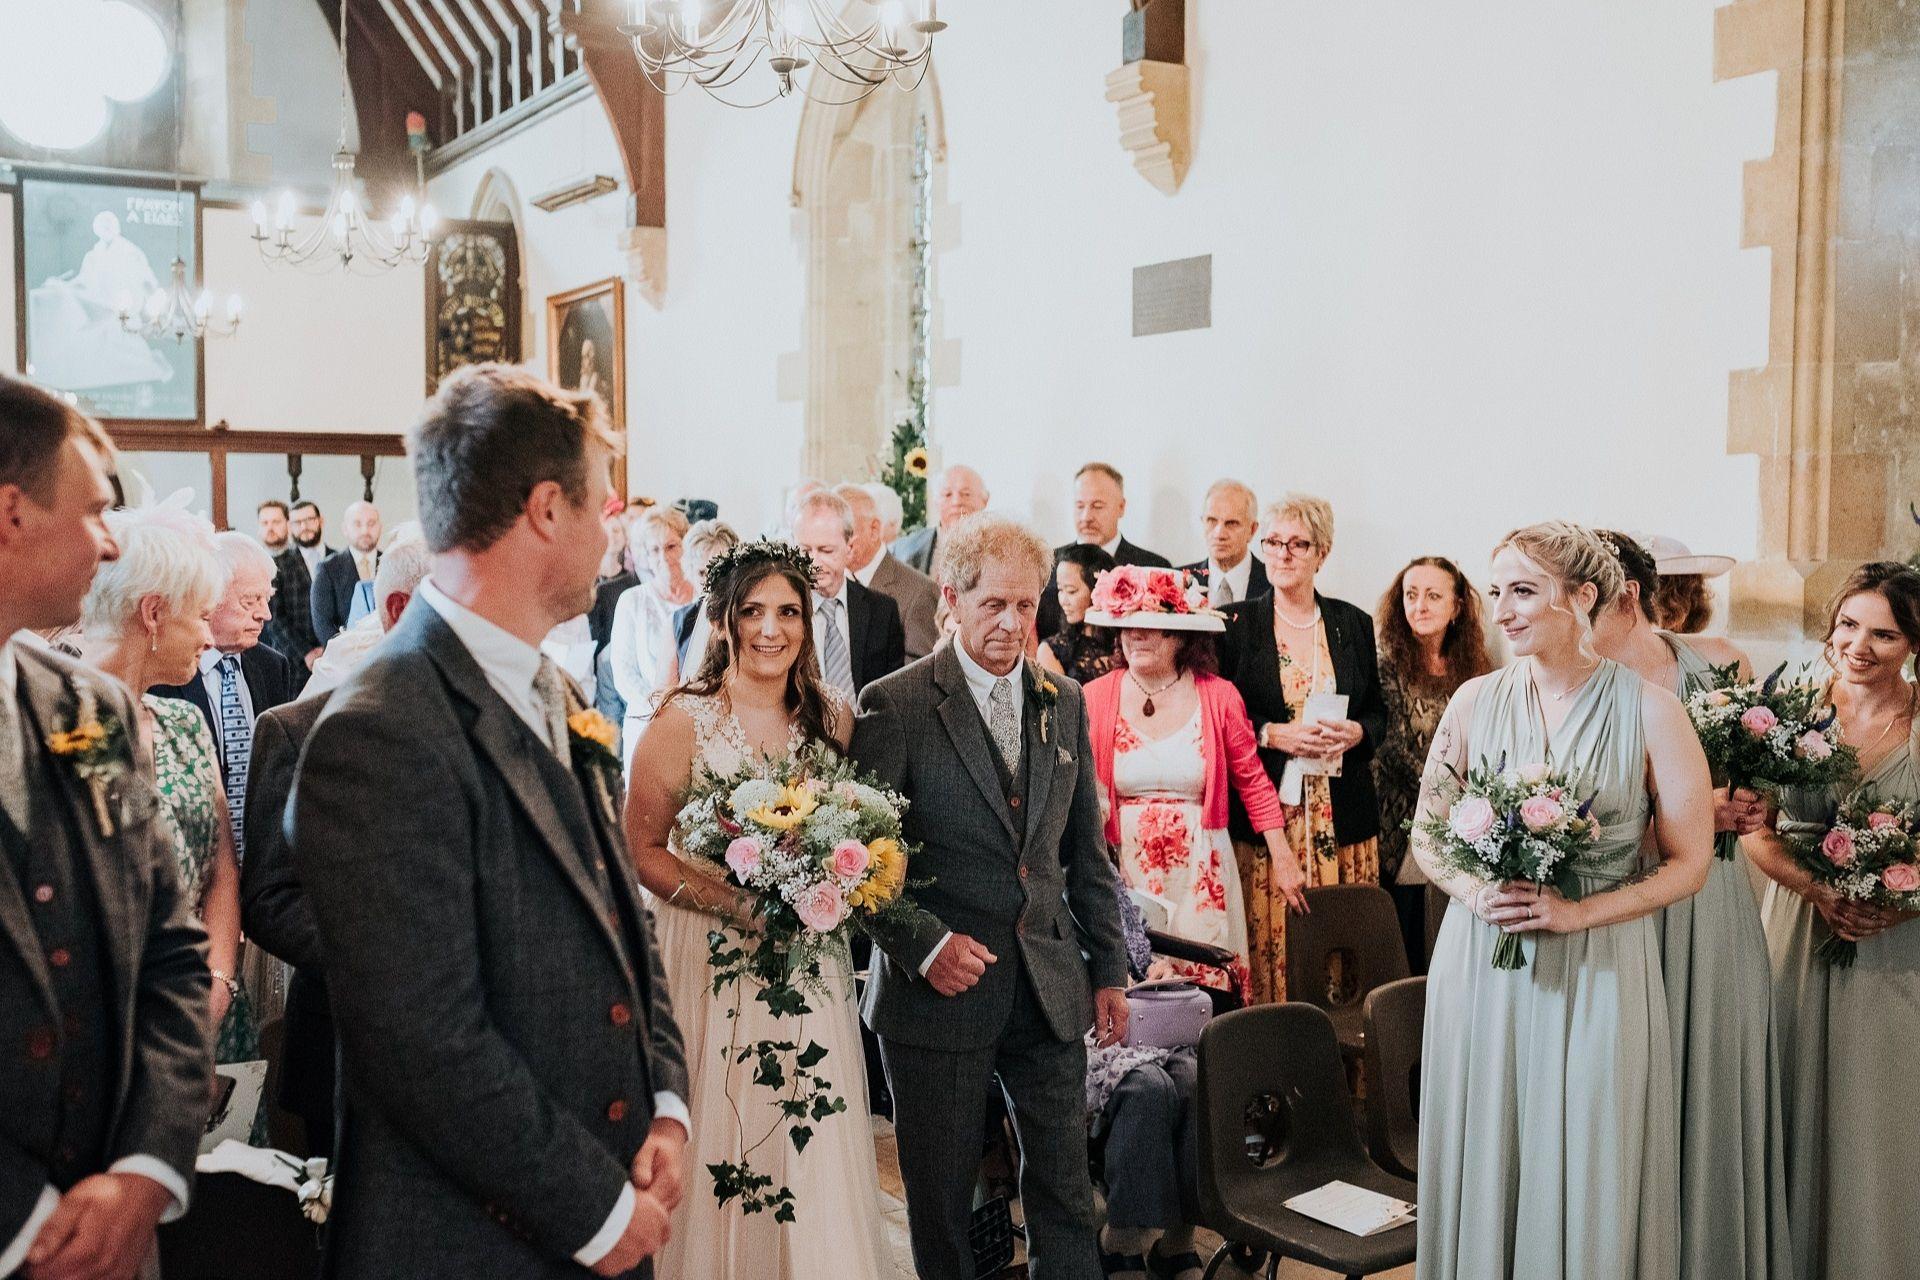 Involving wedding guests